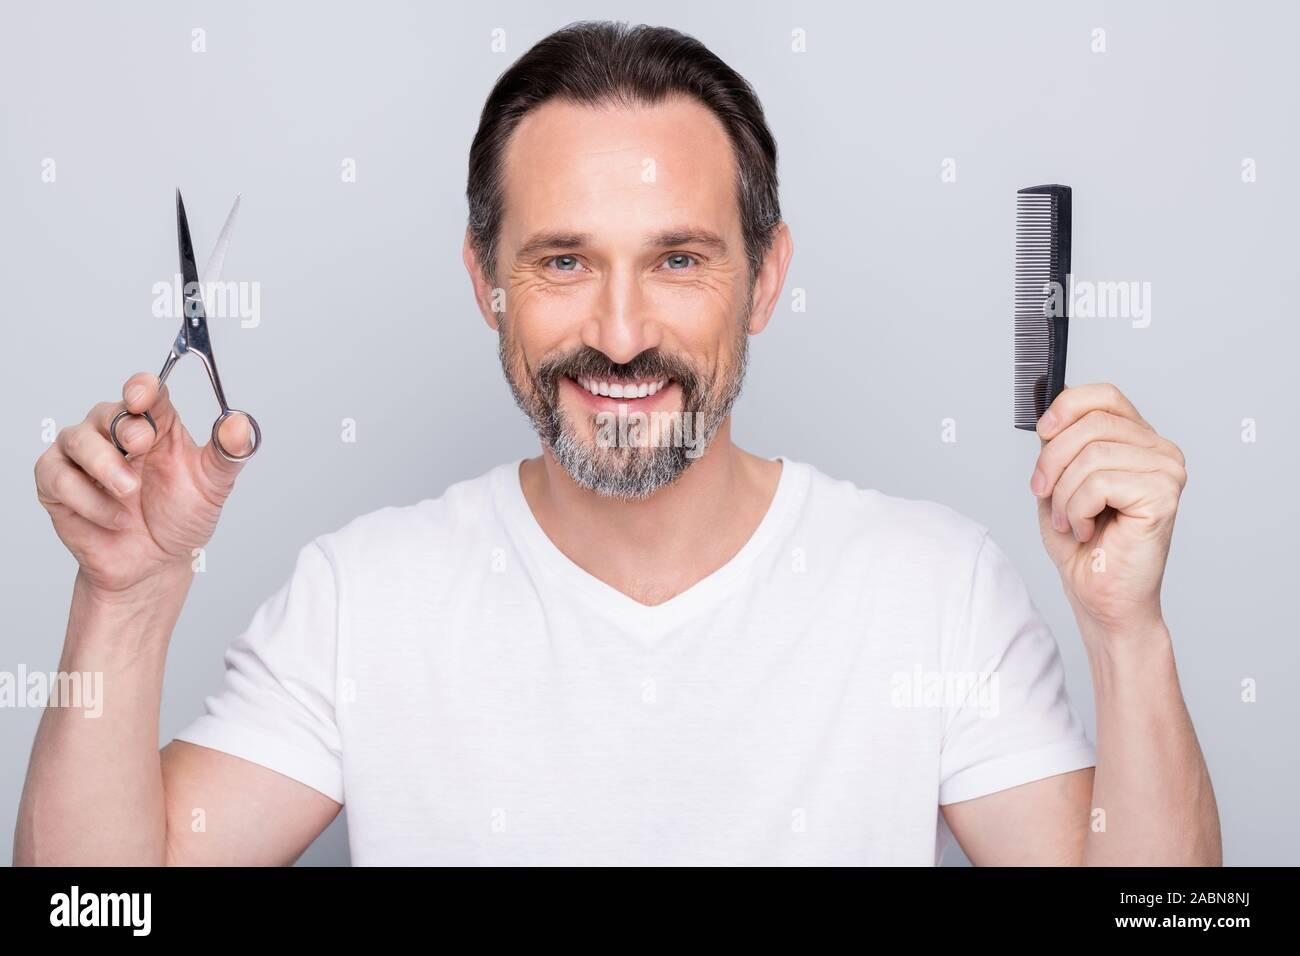 Closeup photo of mature guy metrosexual holding new hairbrush cosmetology hairdo scissors advising option cutting or brushing wear white t-shirt Stock Photo